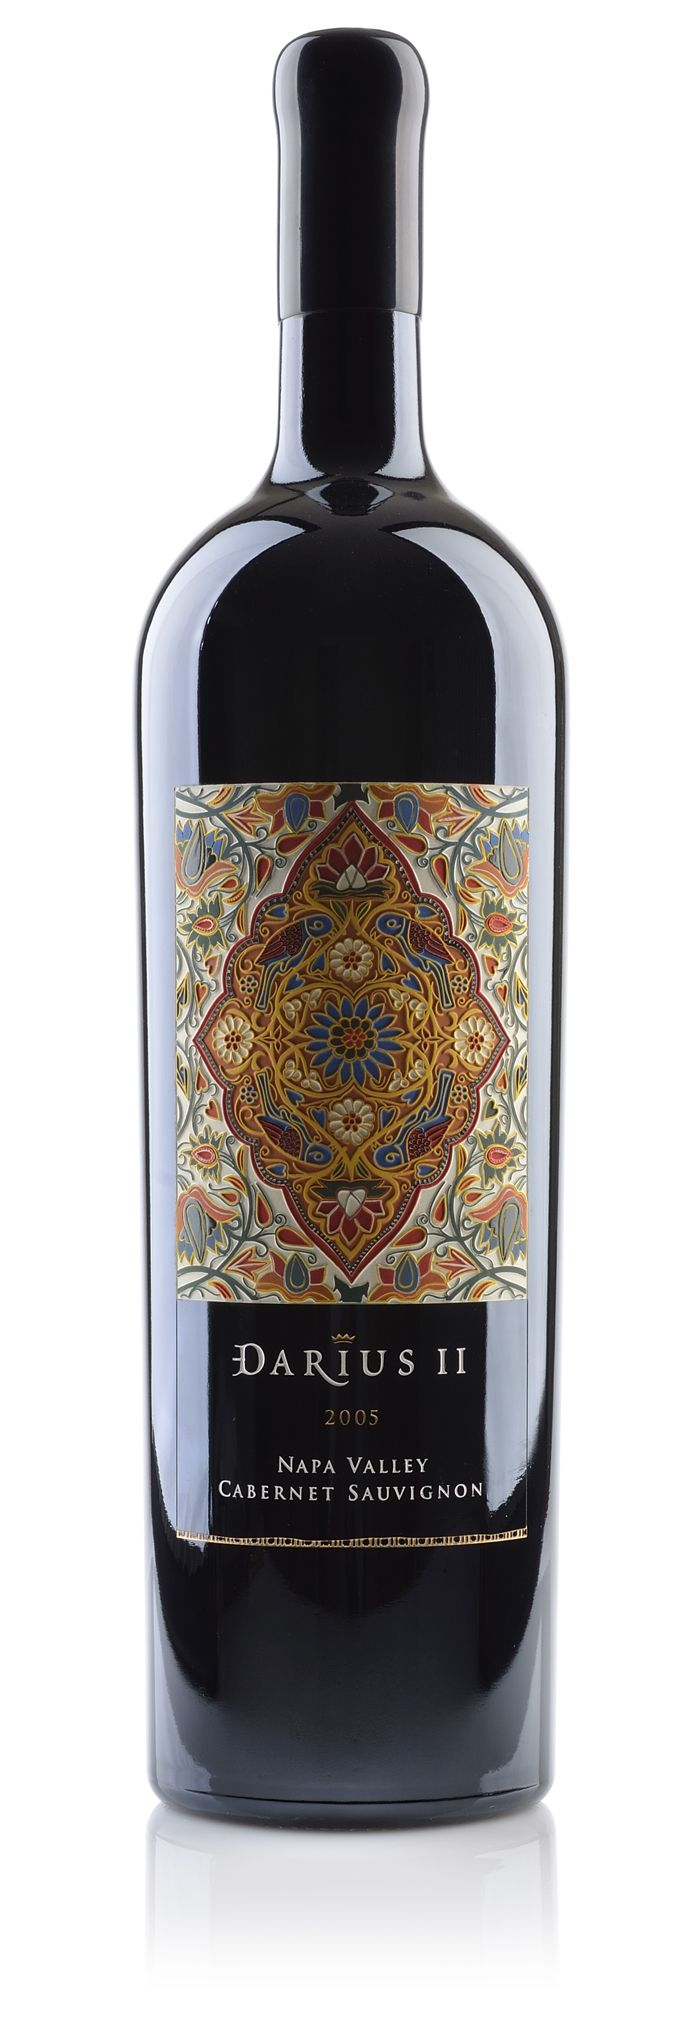 Darioush DariusII - The Dieline -